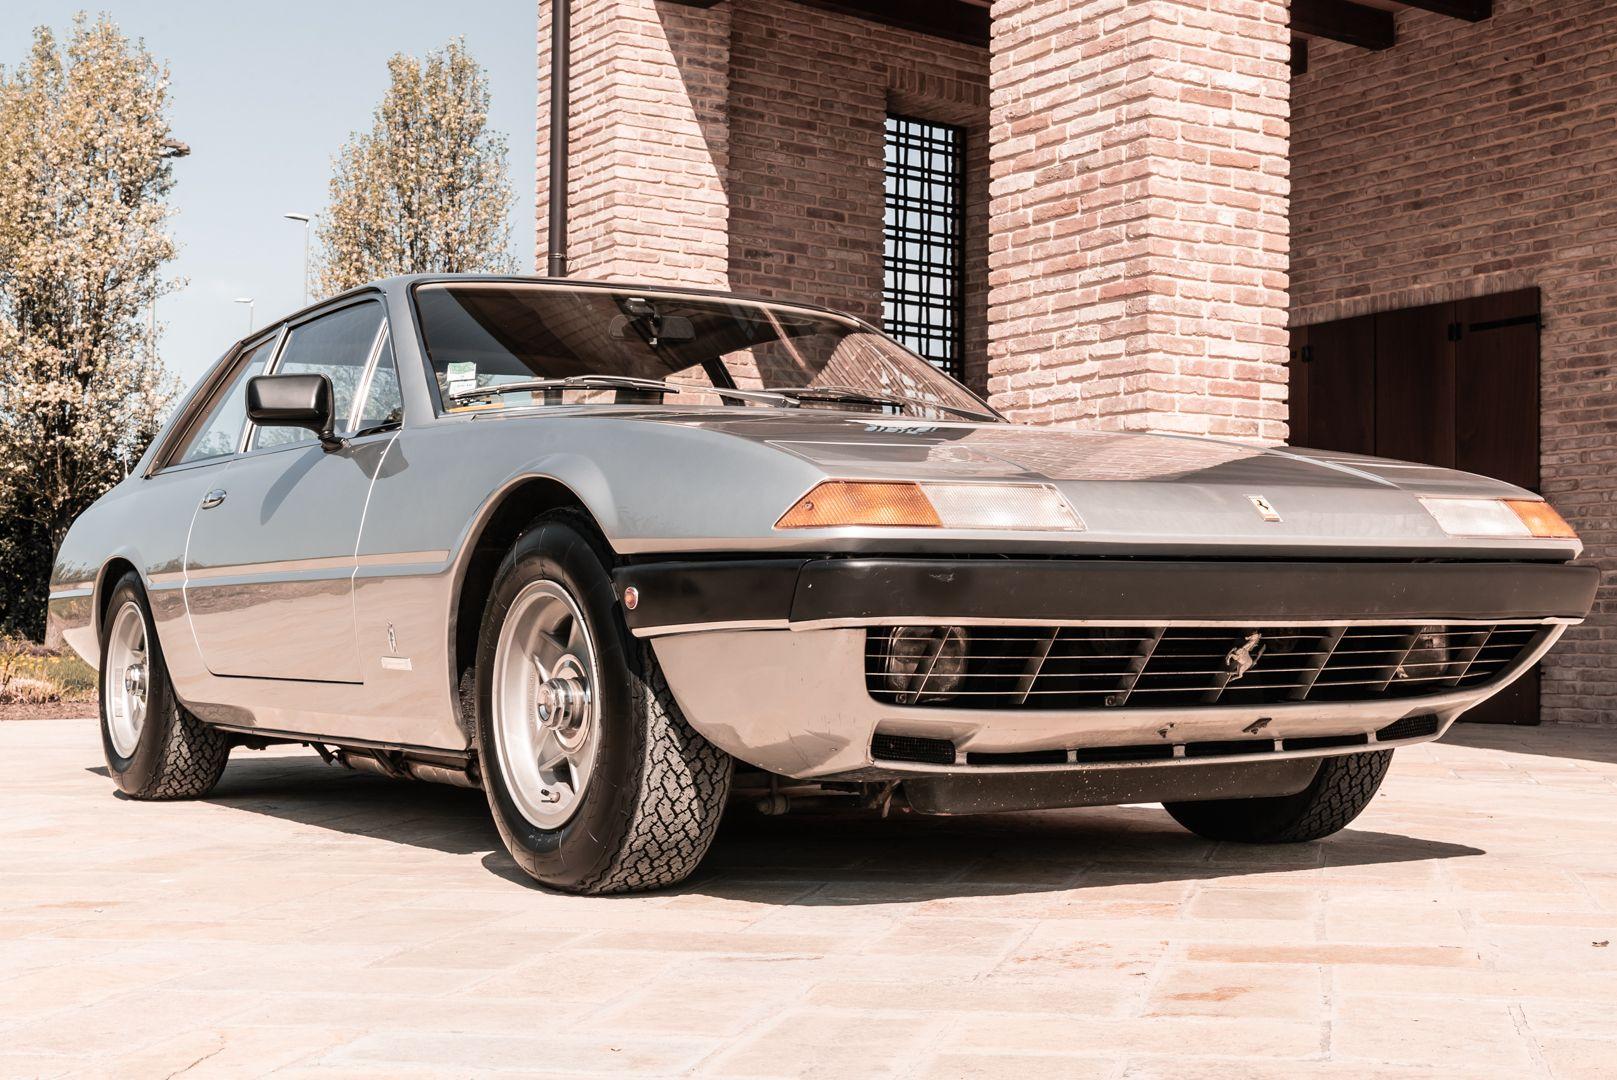 1973 Ferrari 365 GT4 2+2 66401